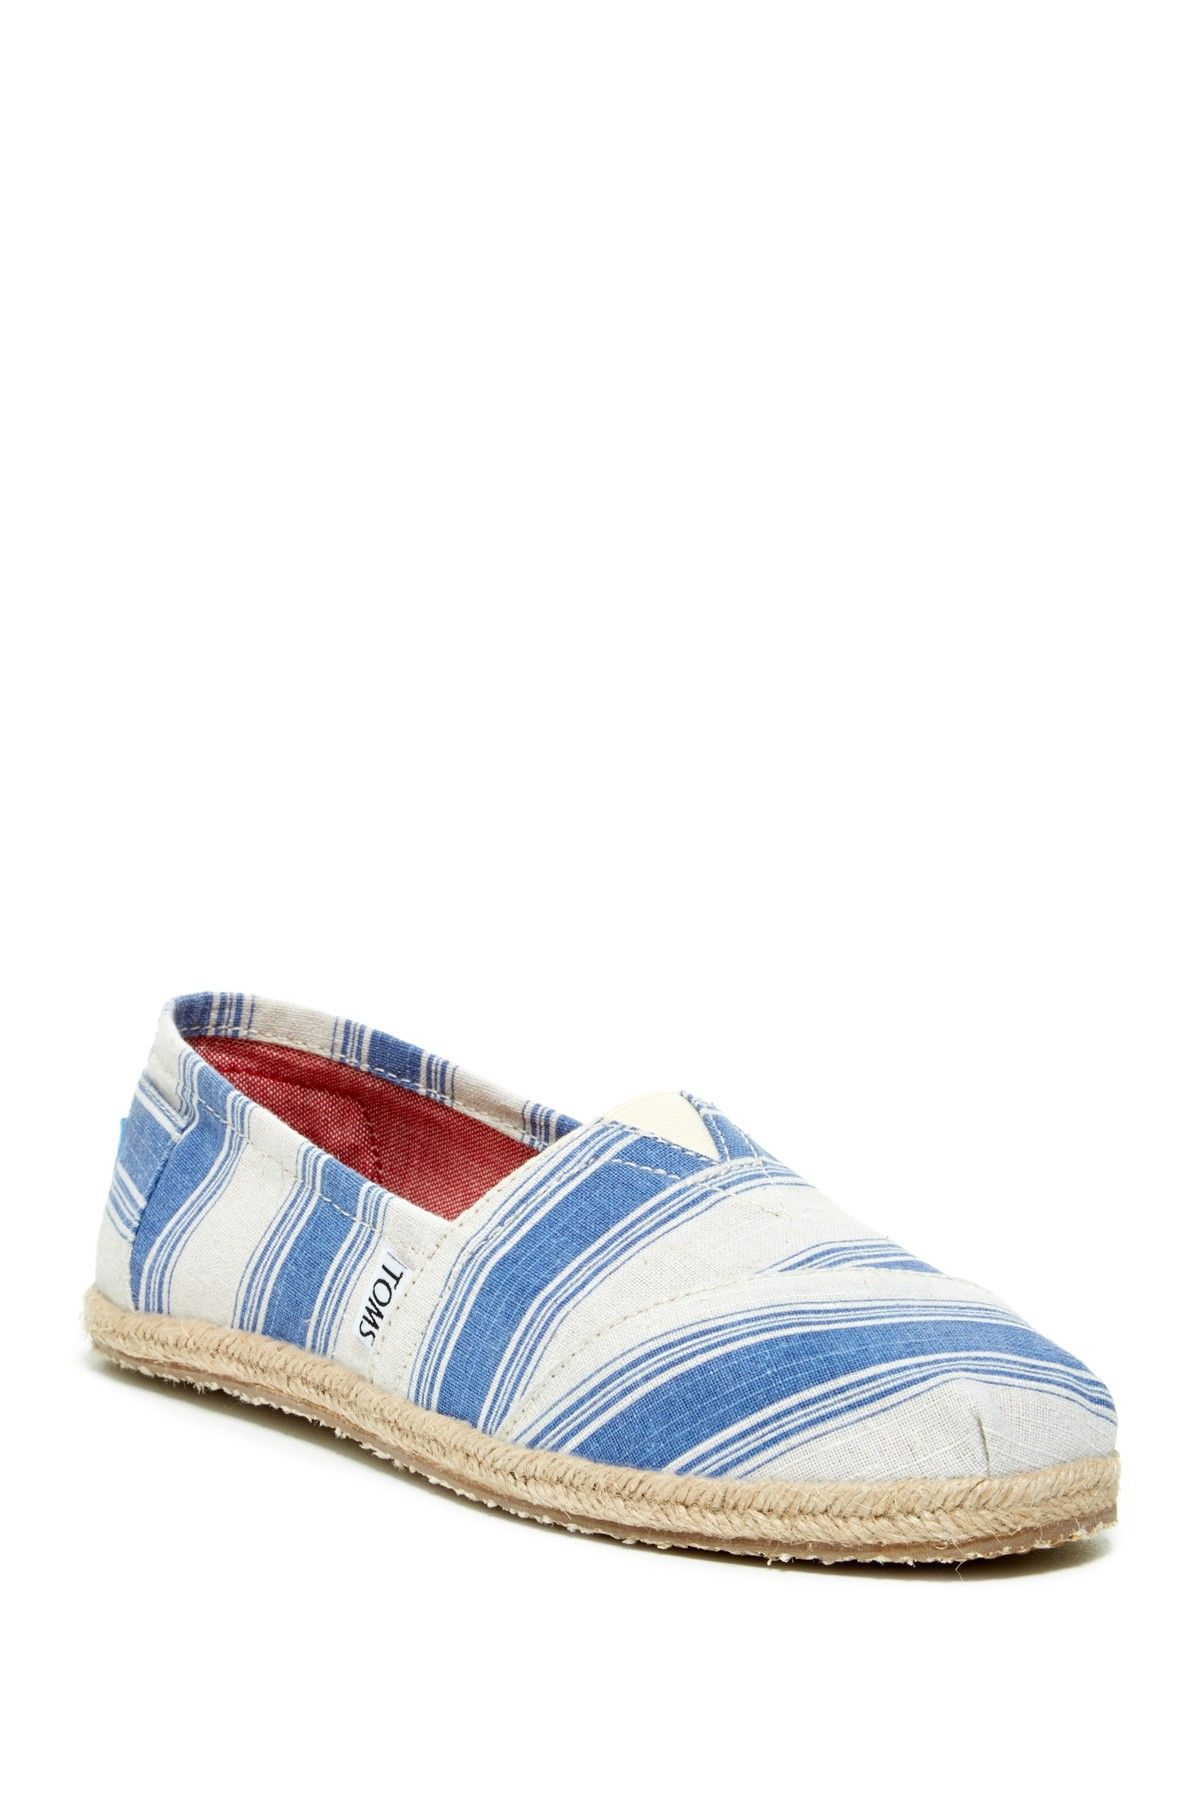 HauteLook | Toms shoes, Toms, Fashion boots